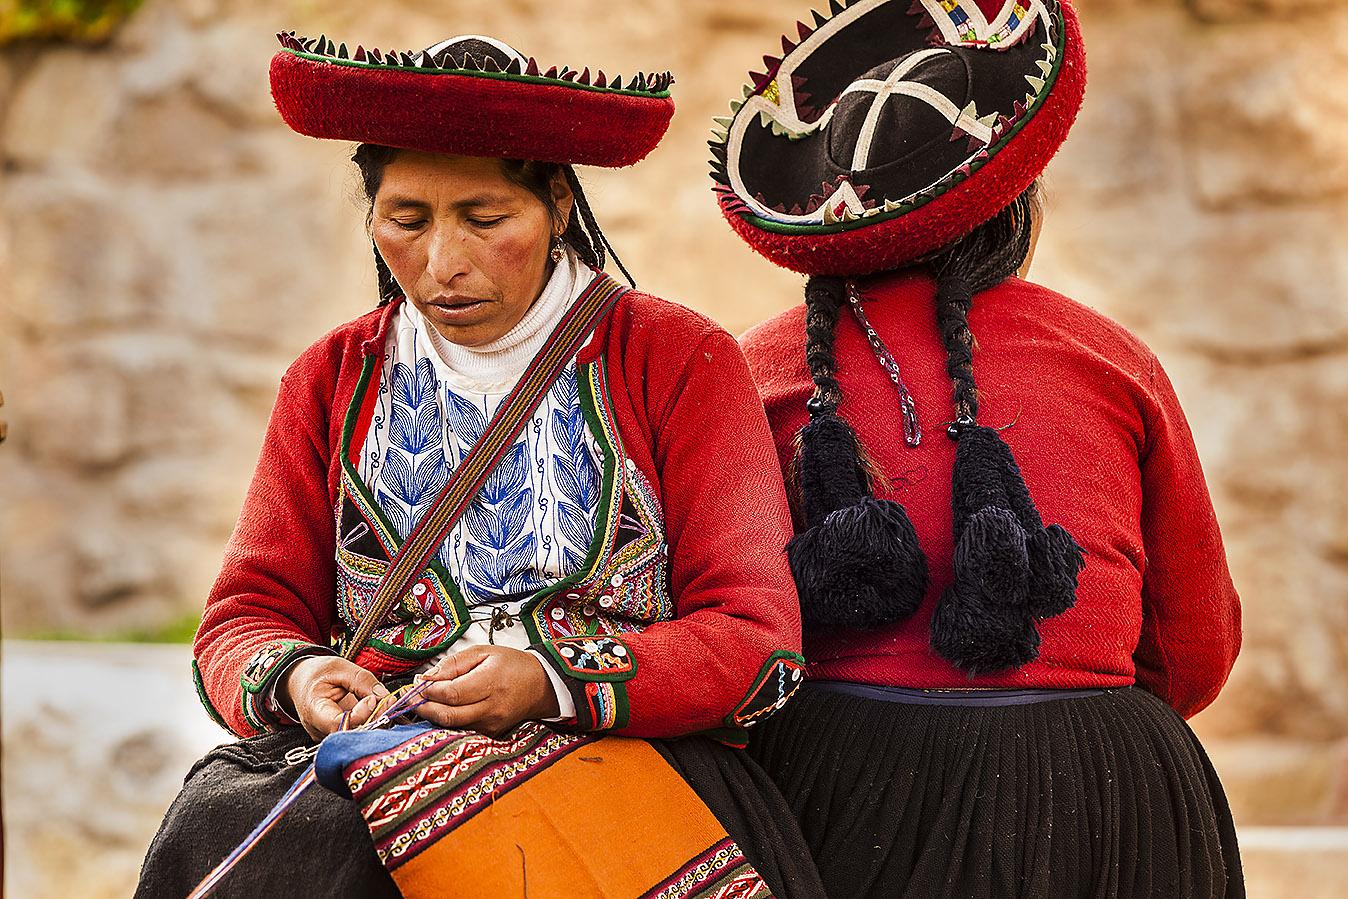 peru, sacred valley, village of Chinchero